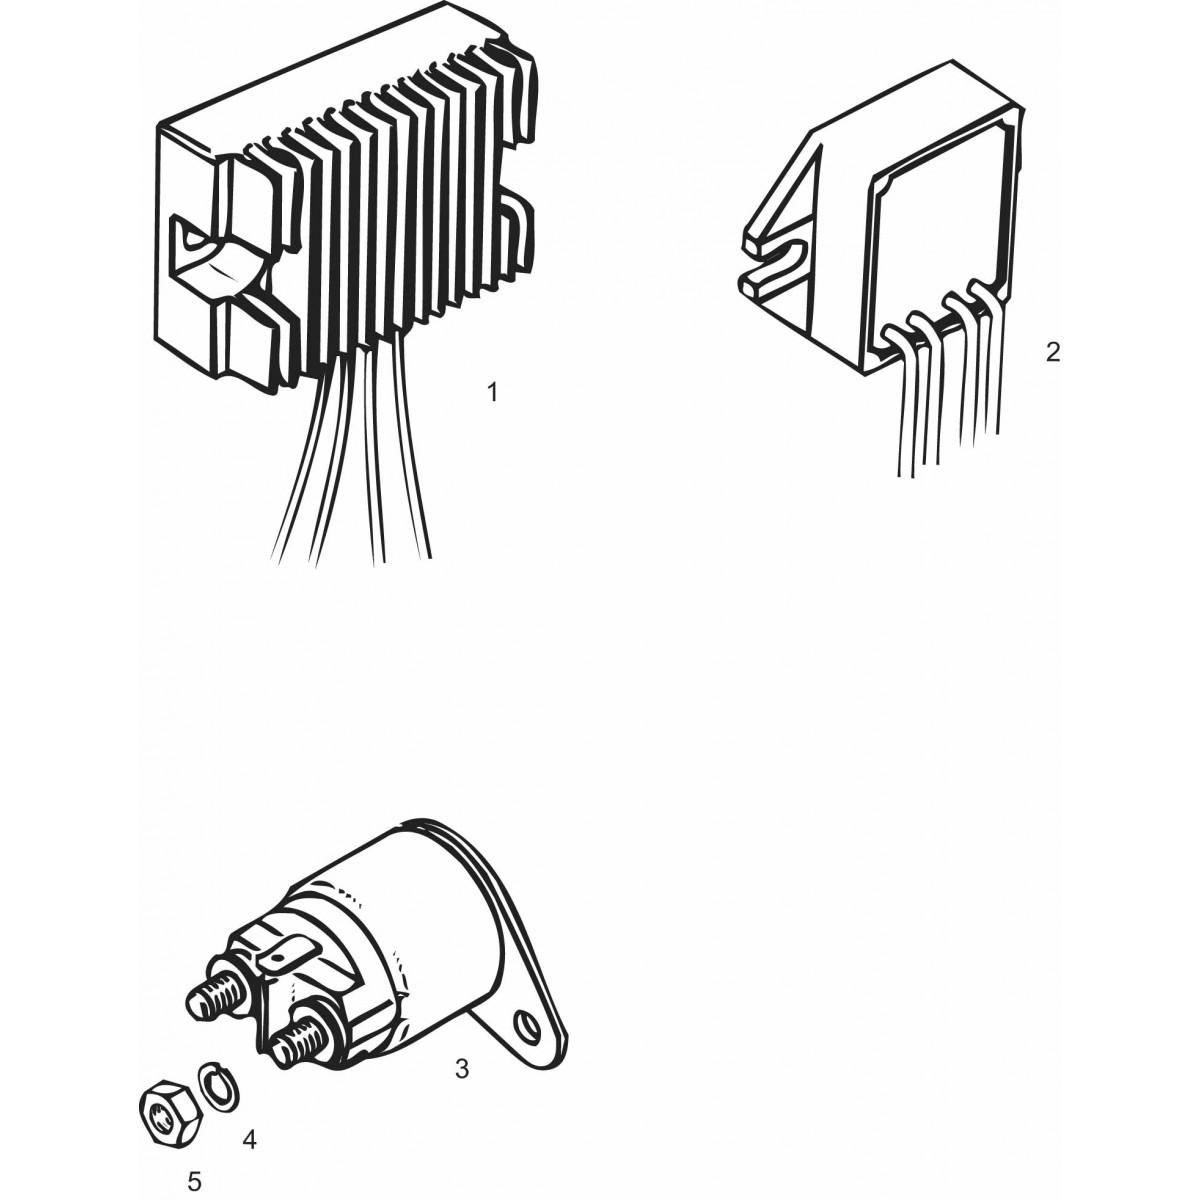 Marvelous Rotax Starters Generators 447 503 582 618 Rectifier Rel Wiring Cloud Xempagosophoxytasticioscodnessplanboapumohammedshrineorg